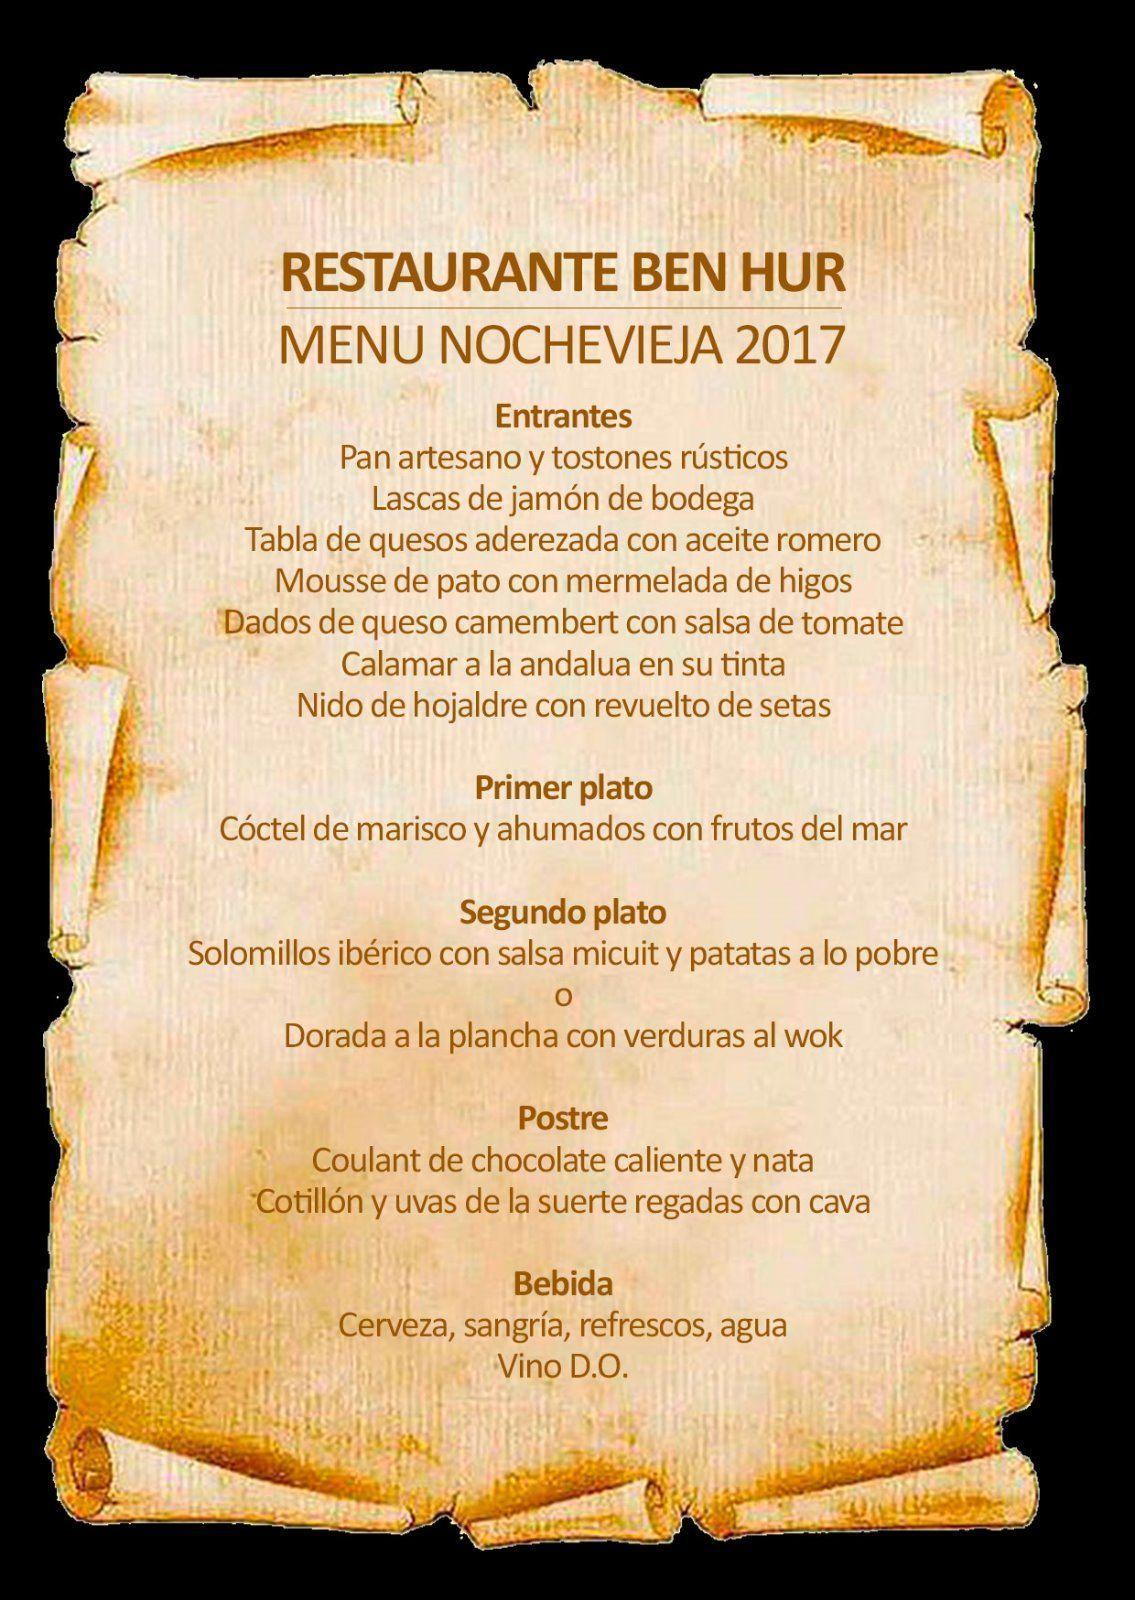 menu ben-hur nochevieja 2017, benidorm